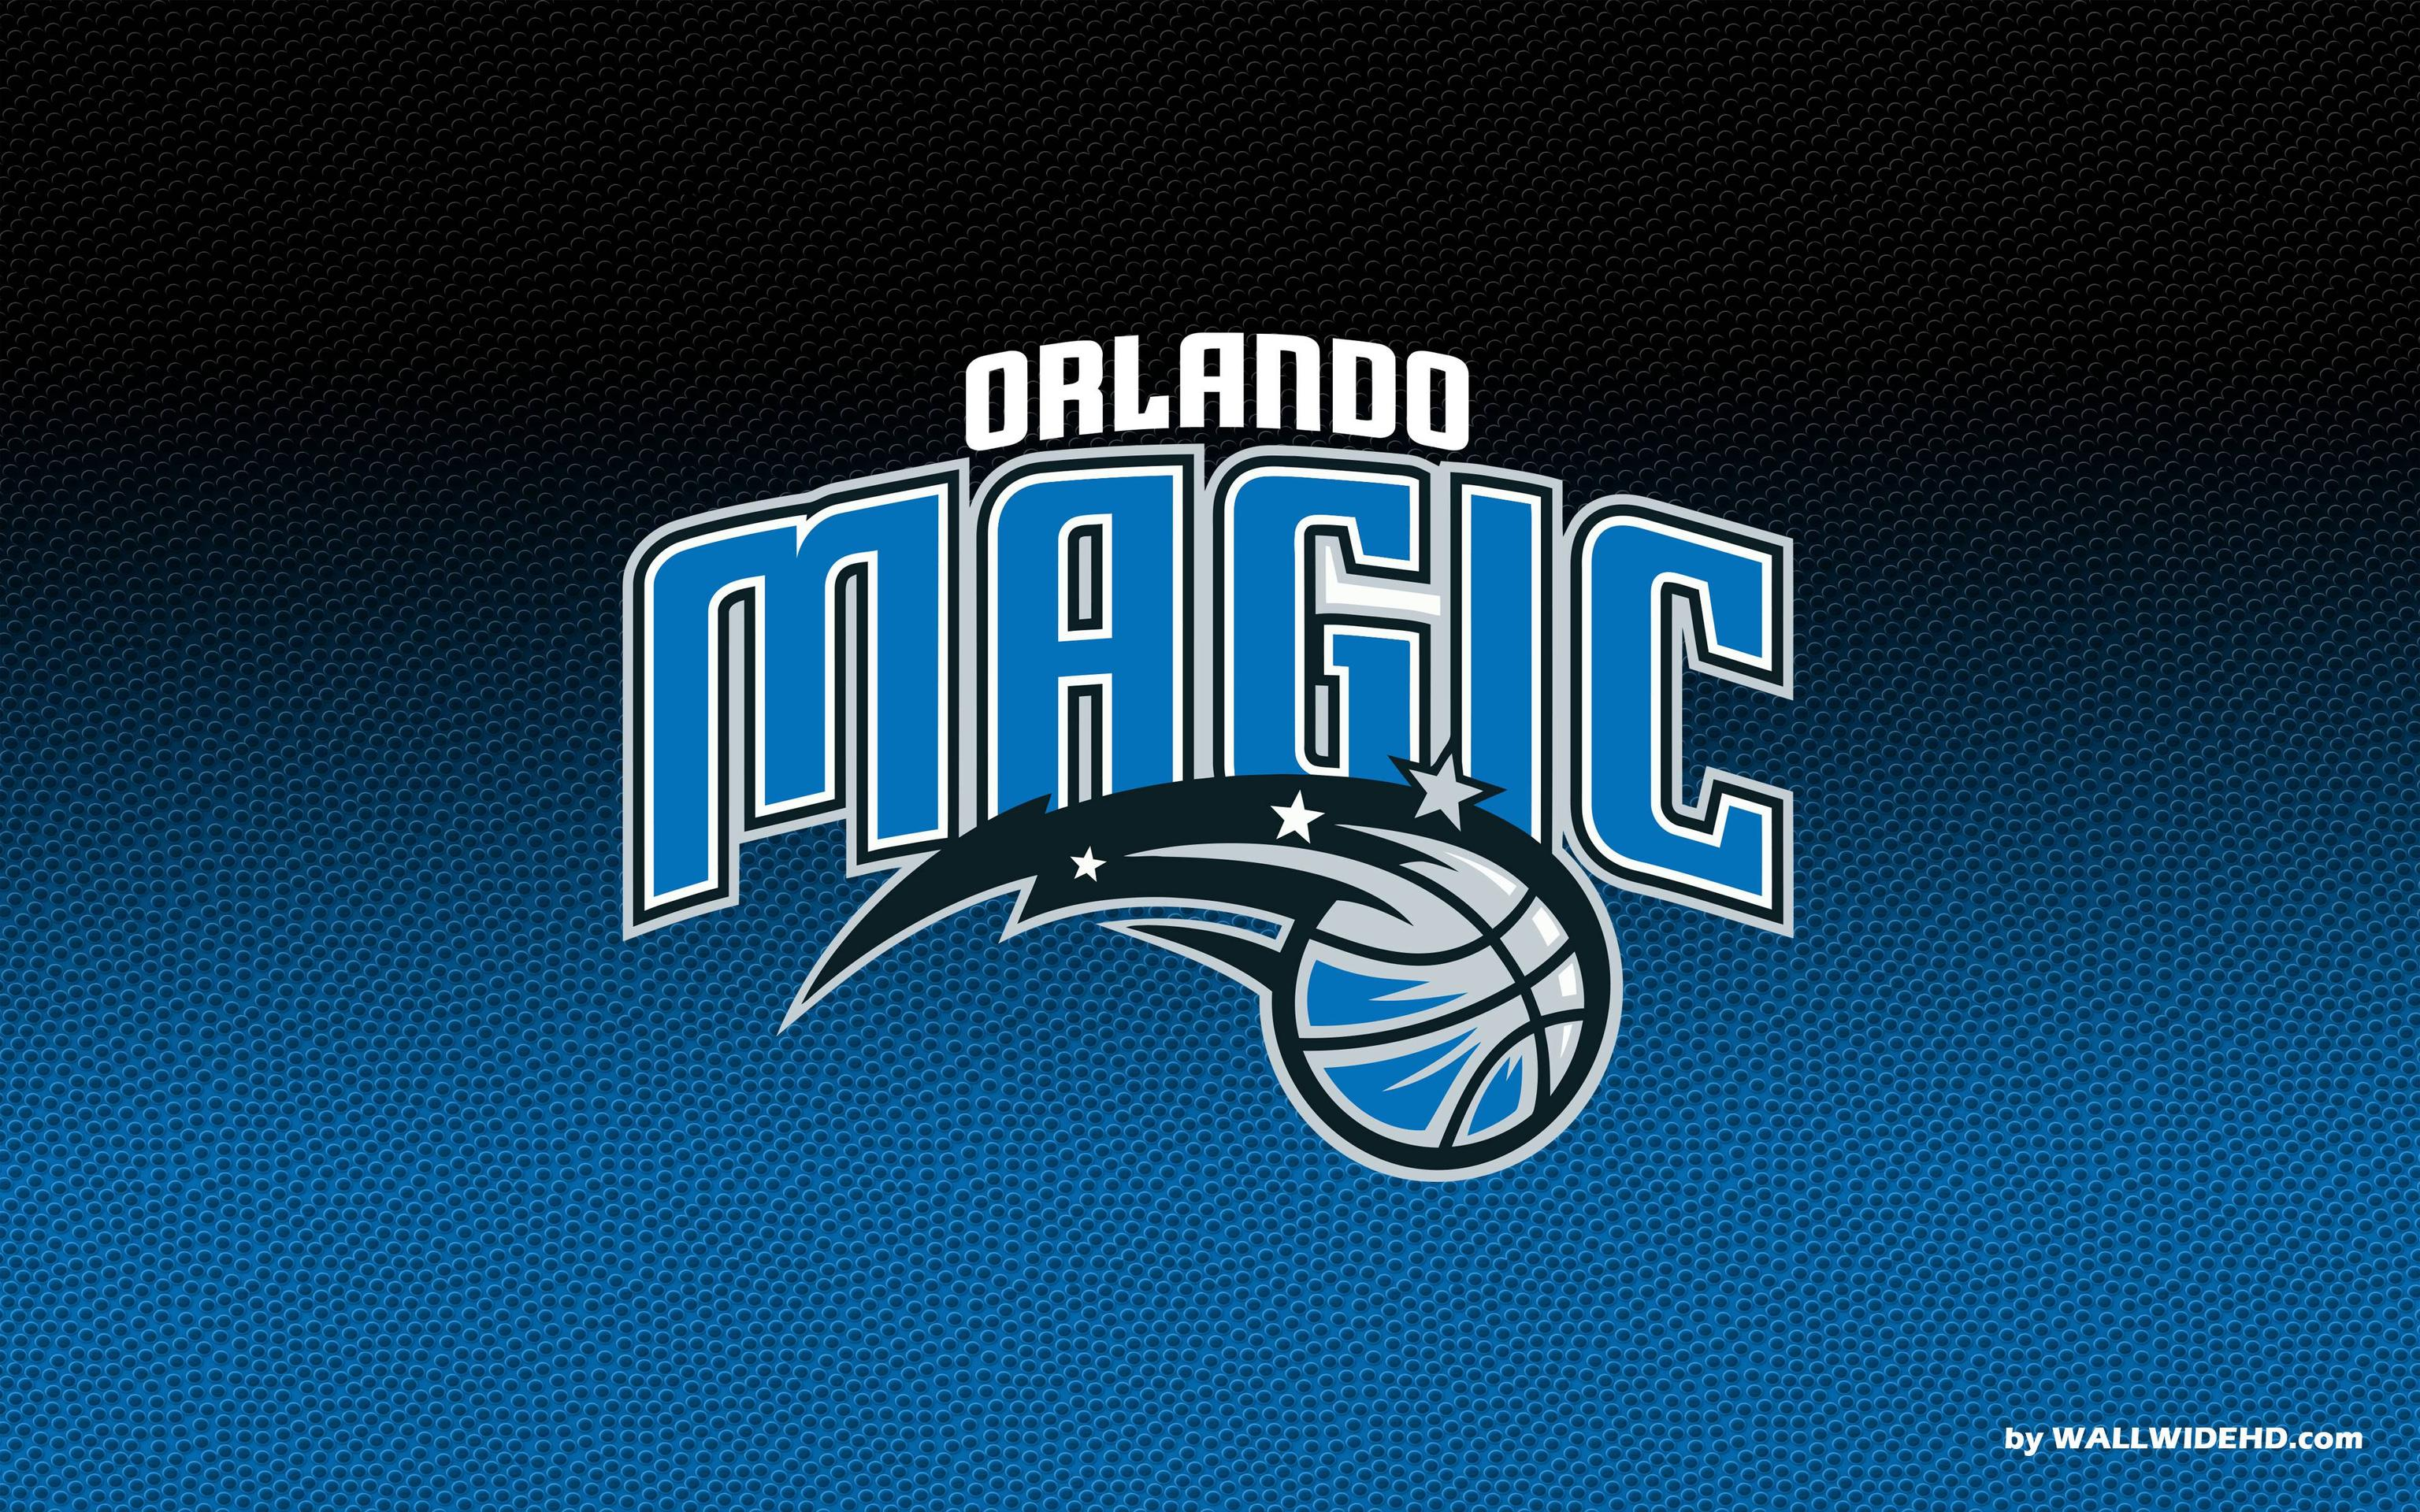 Orlando Magic 2014 Logo NBA Wallpaper Wide or HD | Sports Wallpapers